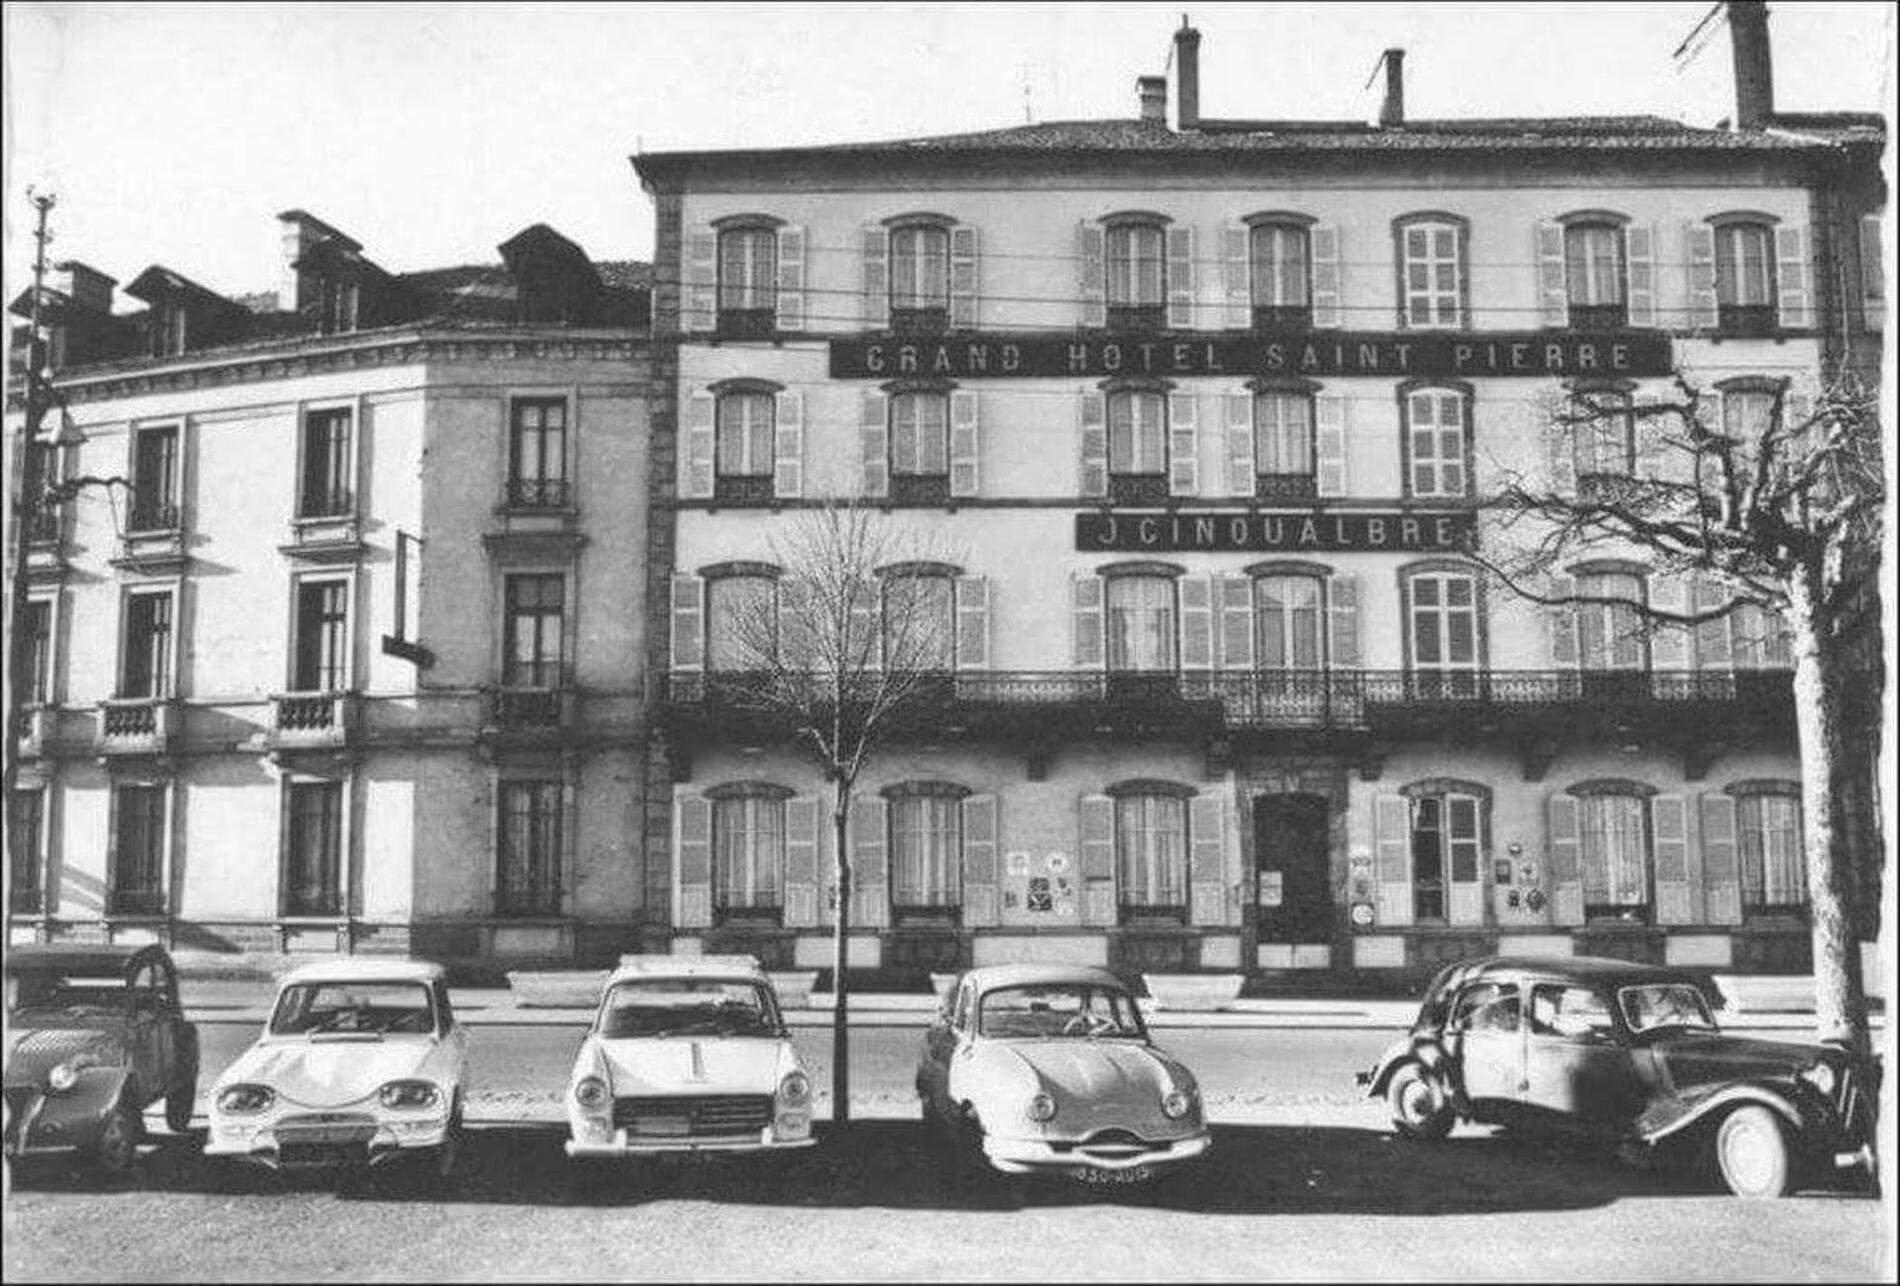 Facade at The Originals Boutique, Grand Hôtel Saint-Pierre